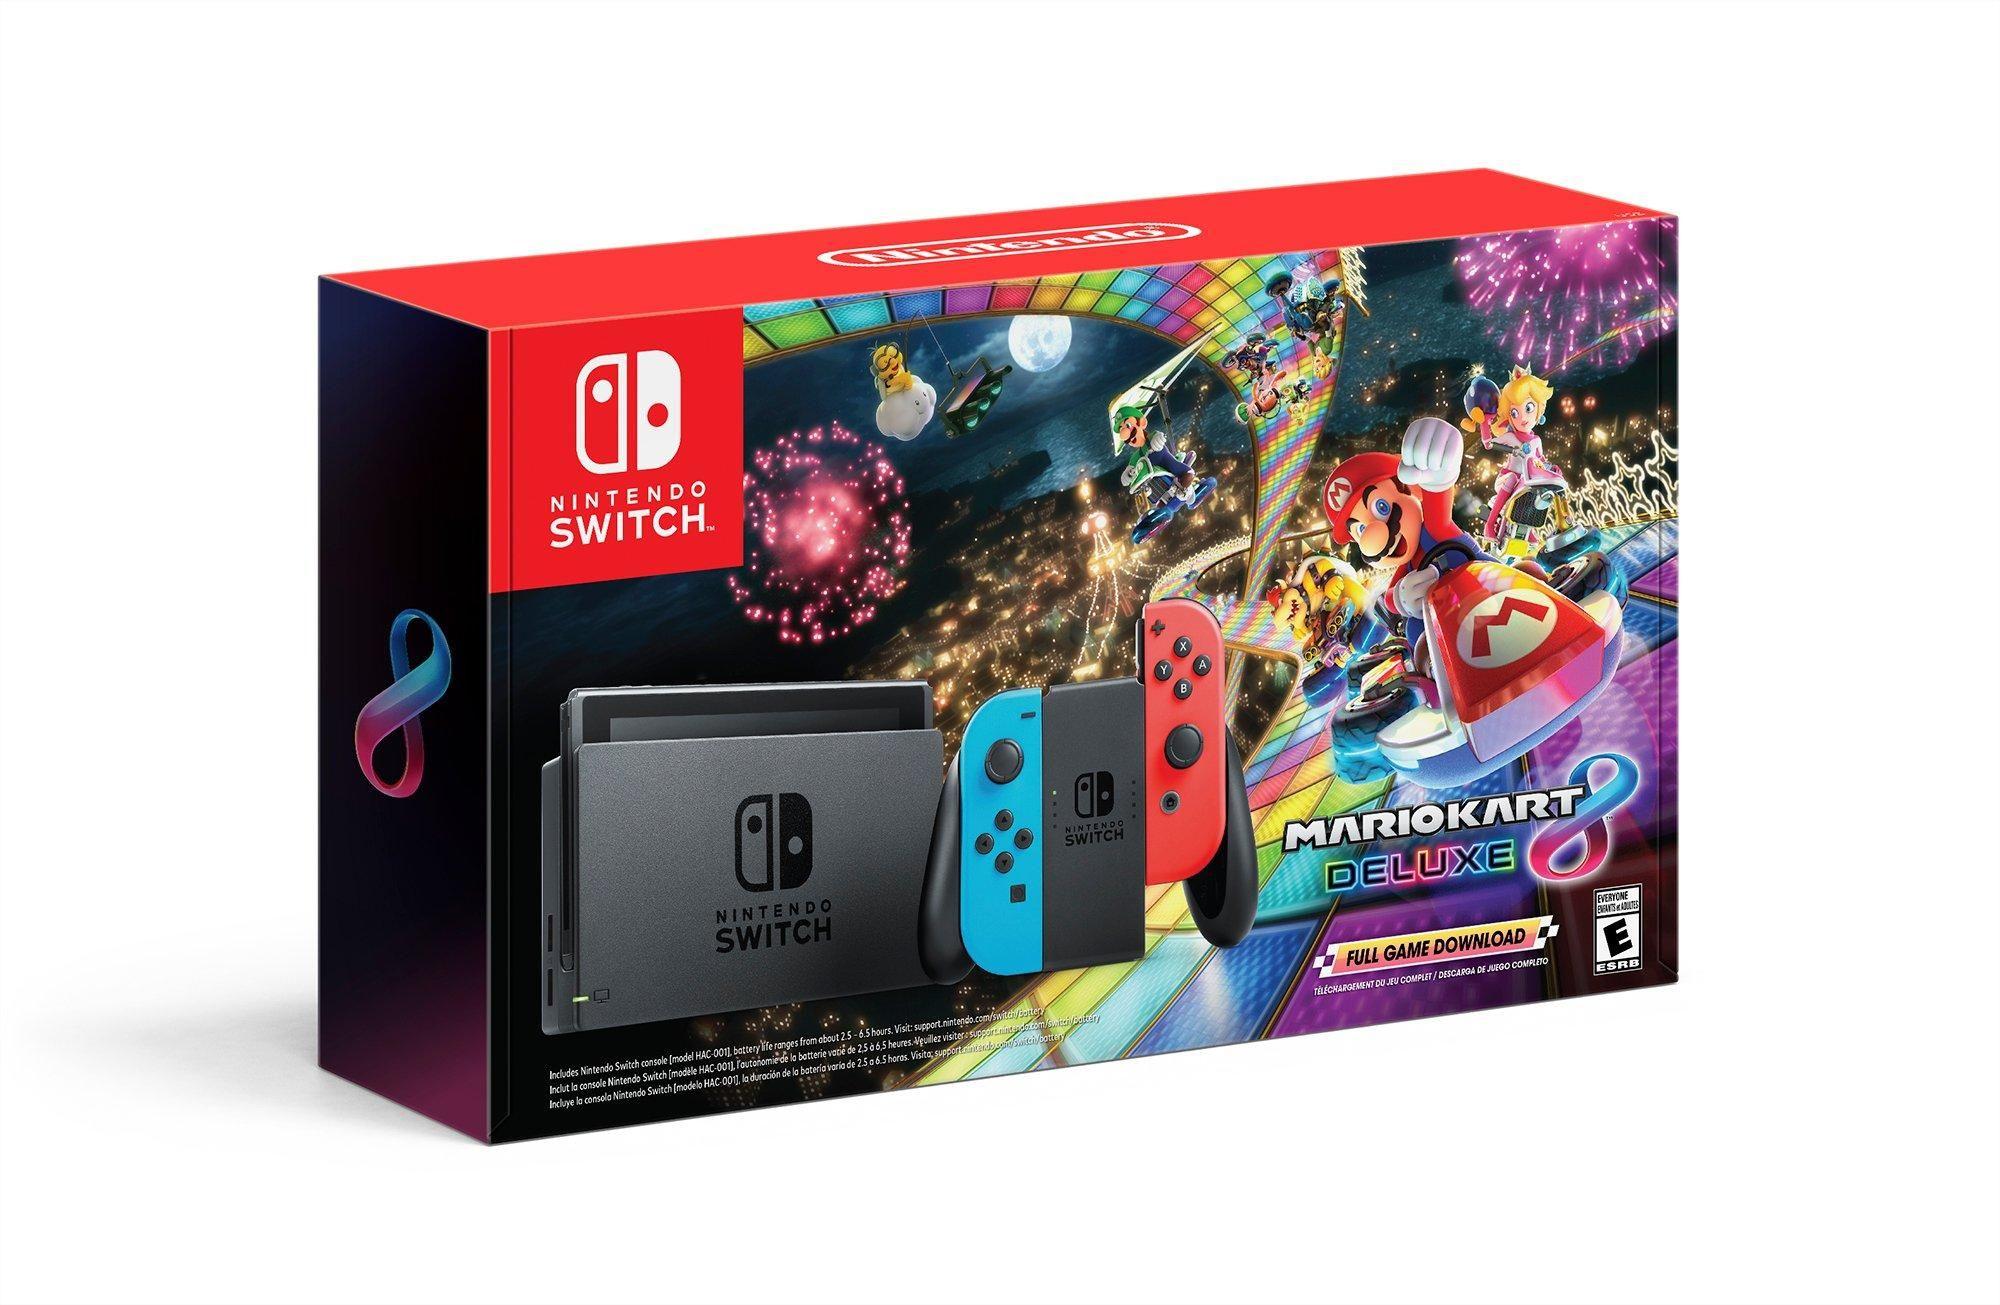 Nintendo Switch Mario Kart 8 Deluxe Bundle With Neon Blue And Neon Red Joy Con Nintendo Switch Gamestop Nintendo Switch Buy Nintendo Switch Mario Kart 8